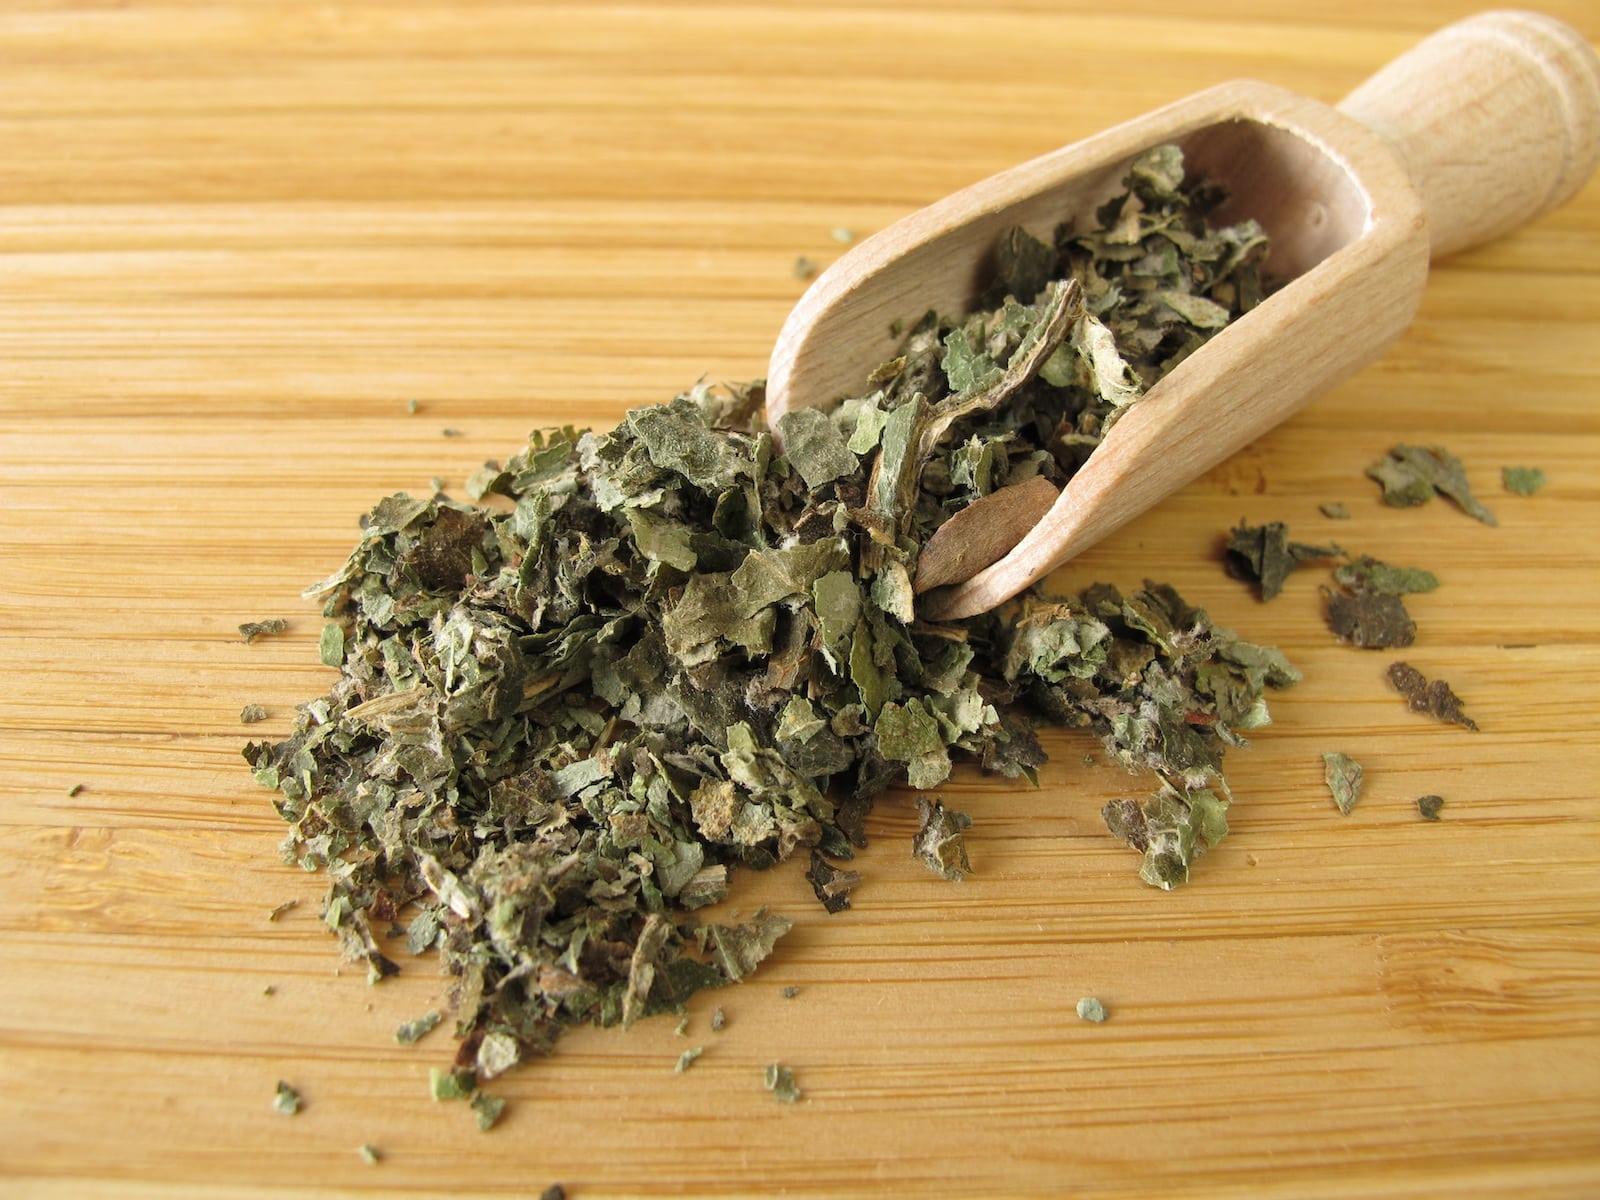 Butterbur: The Migraine Herb